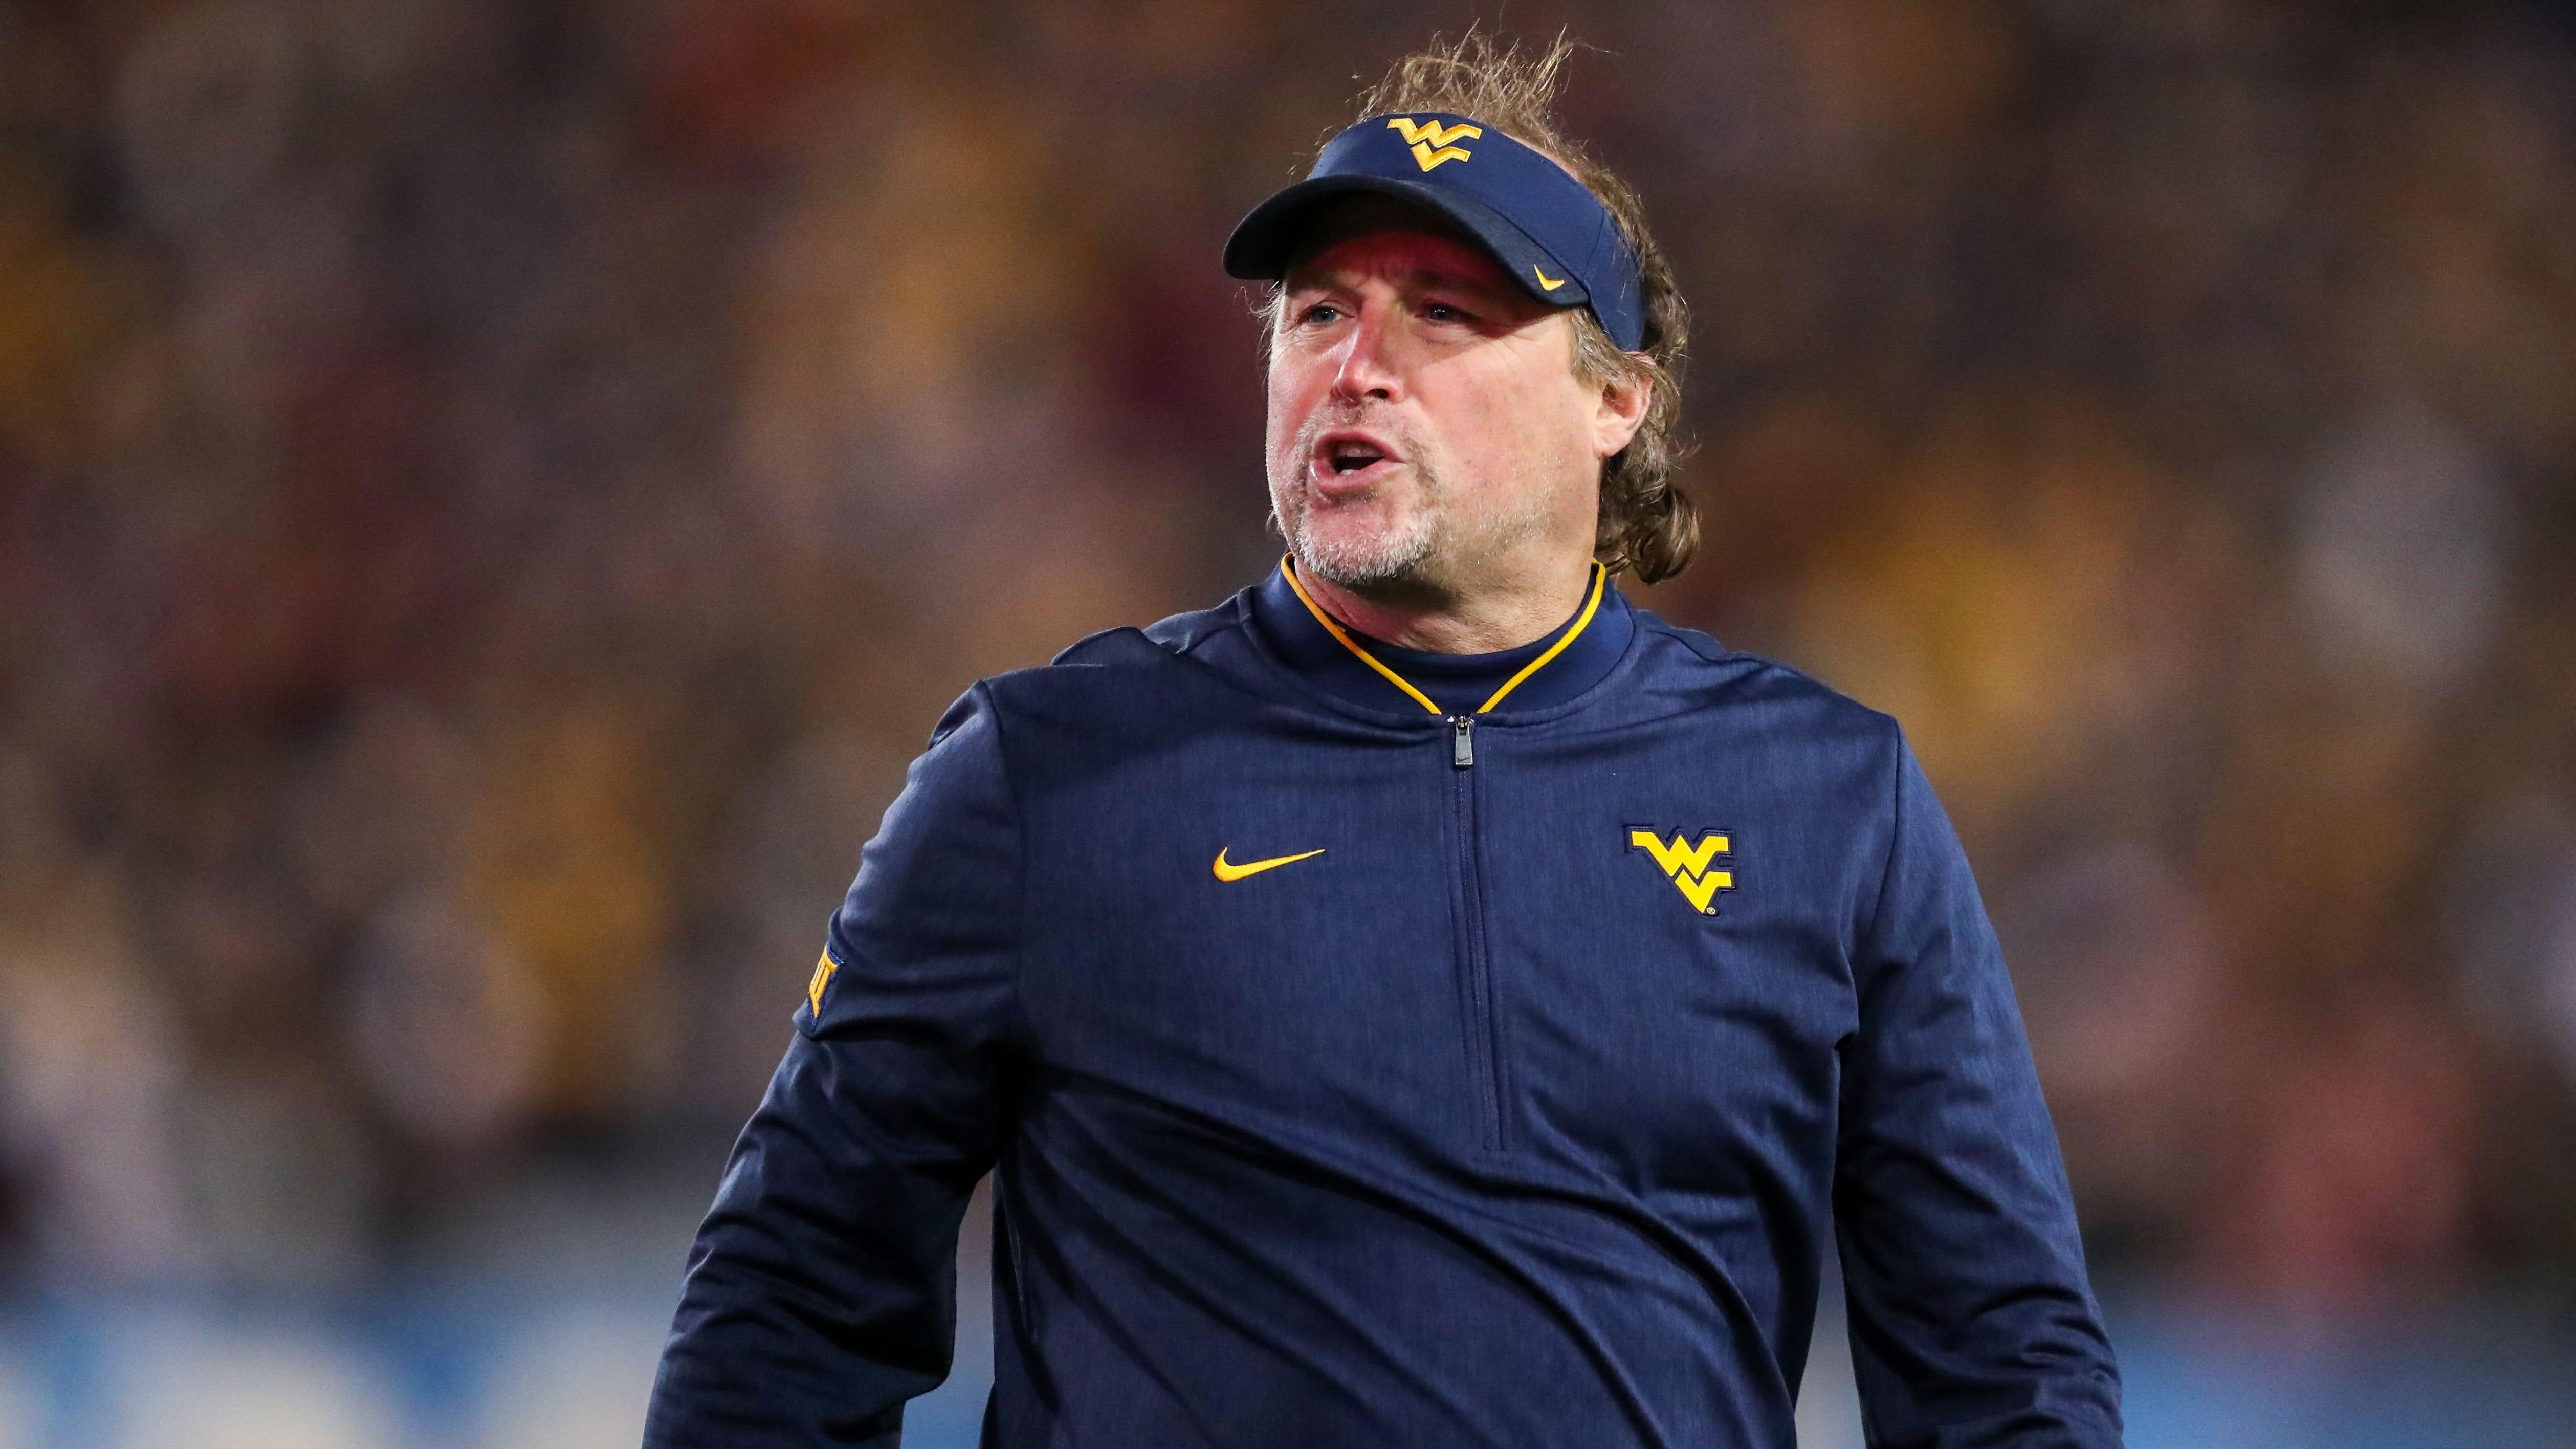 Houston Hires Dana Holgorsen As Football Coach From West Virginia